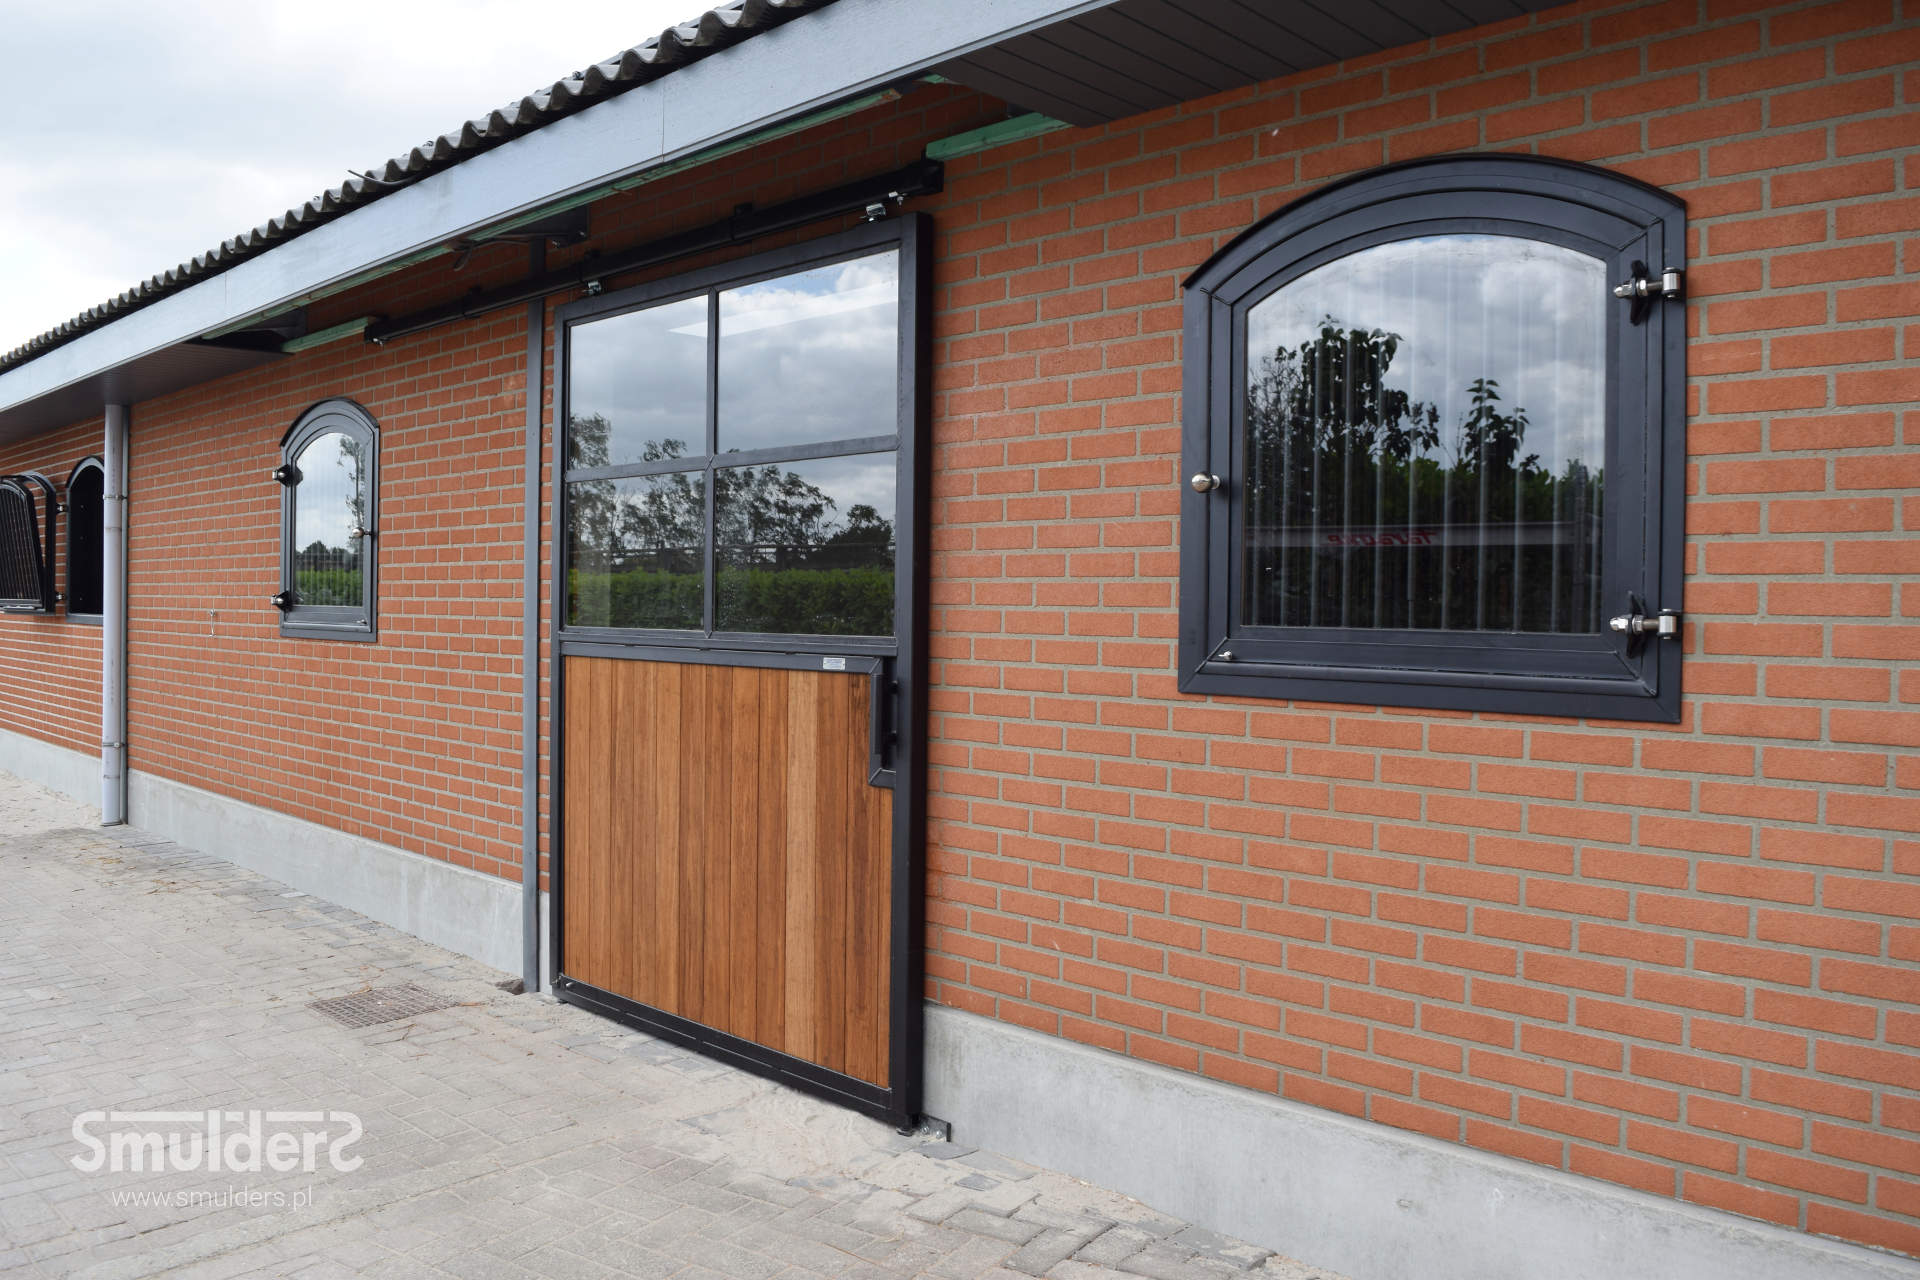 https://www.smulders.pl/wp-content/uploads/2019/02/f008_stable-doors_SMULDERS_PL.jpg